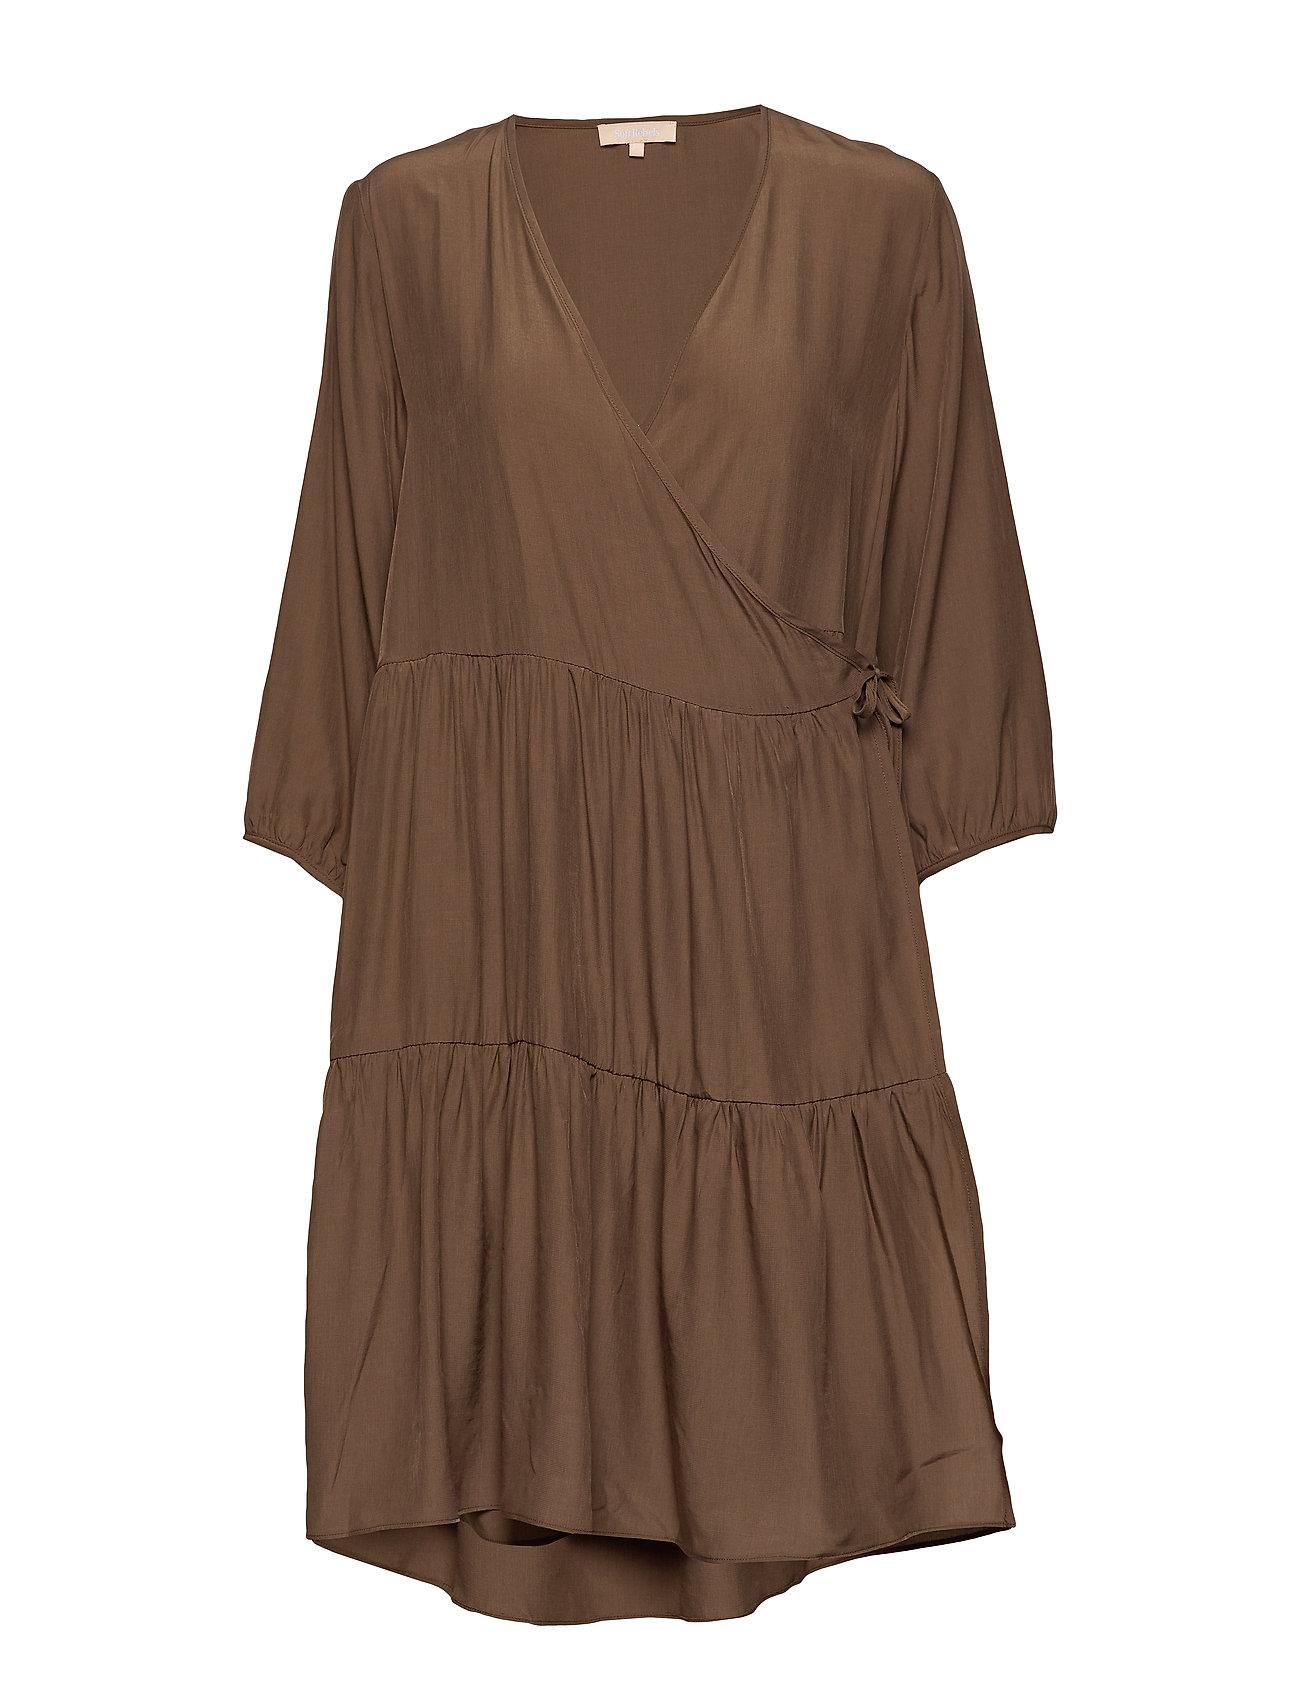 Soft Rebels Stella 3/4 Dress - PARTRIDGE